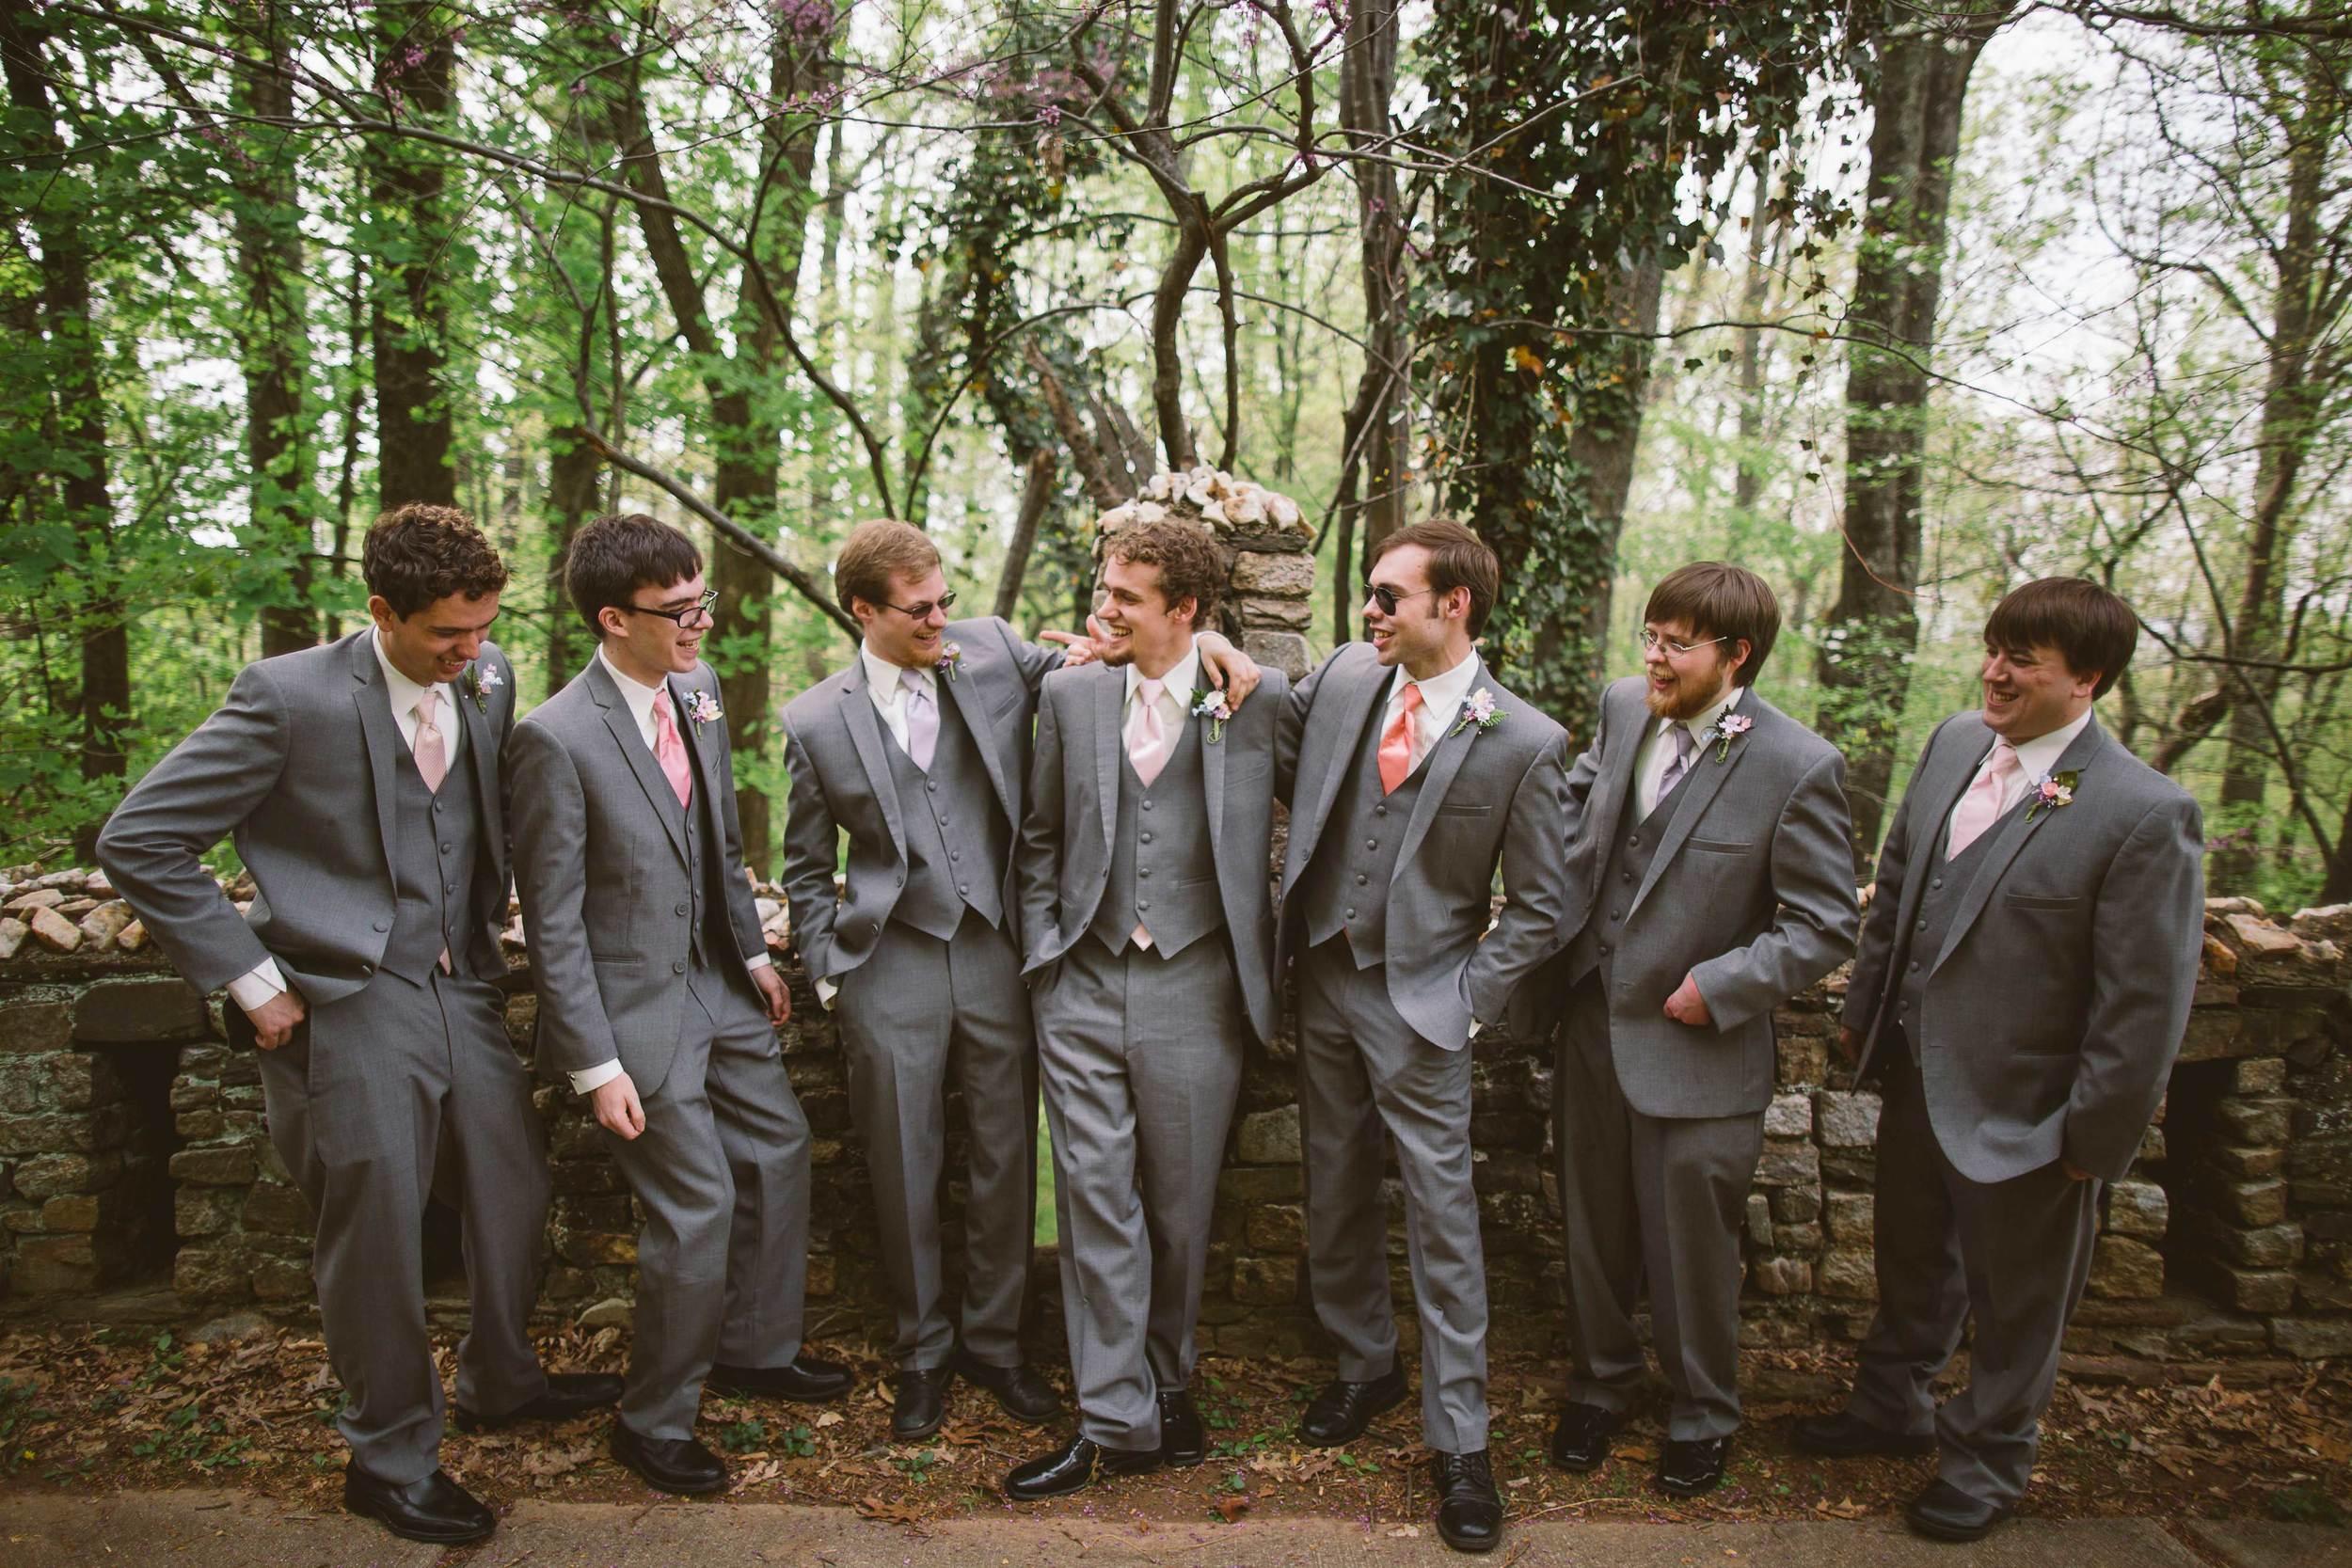 Radka-Wedding-Radka-April-18-2015-0330.jpg